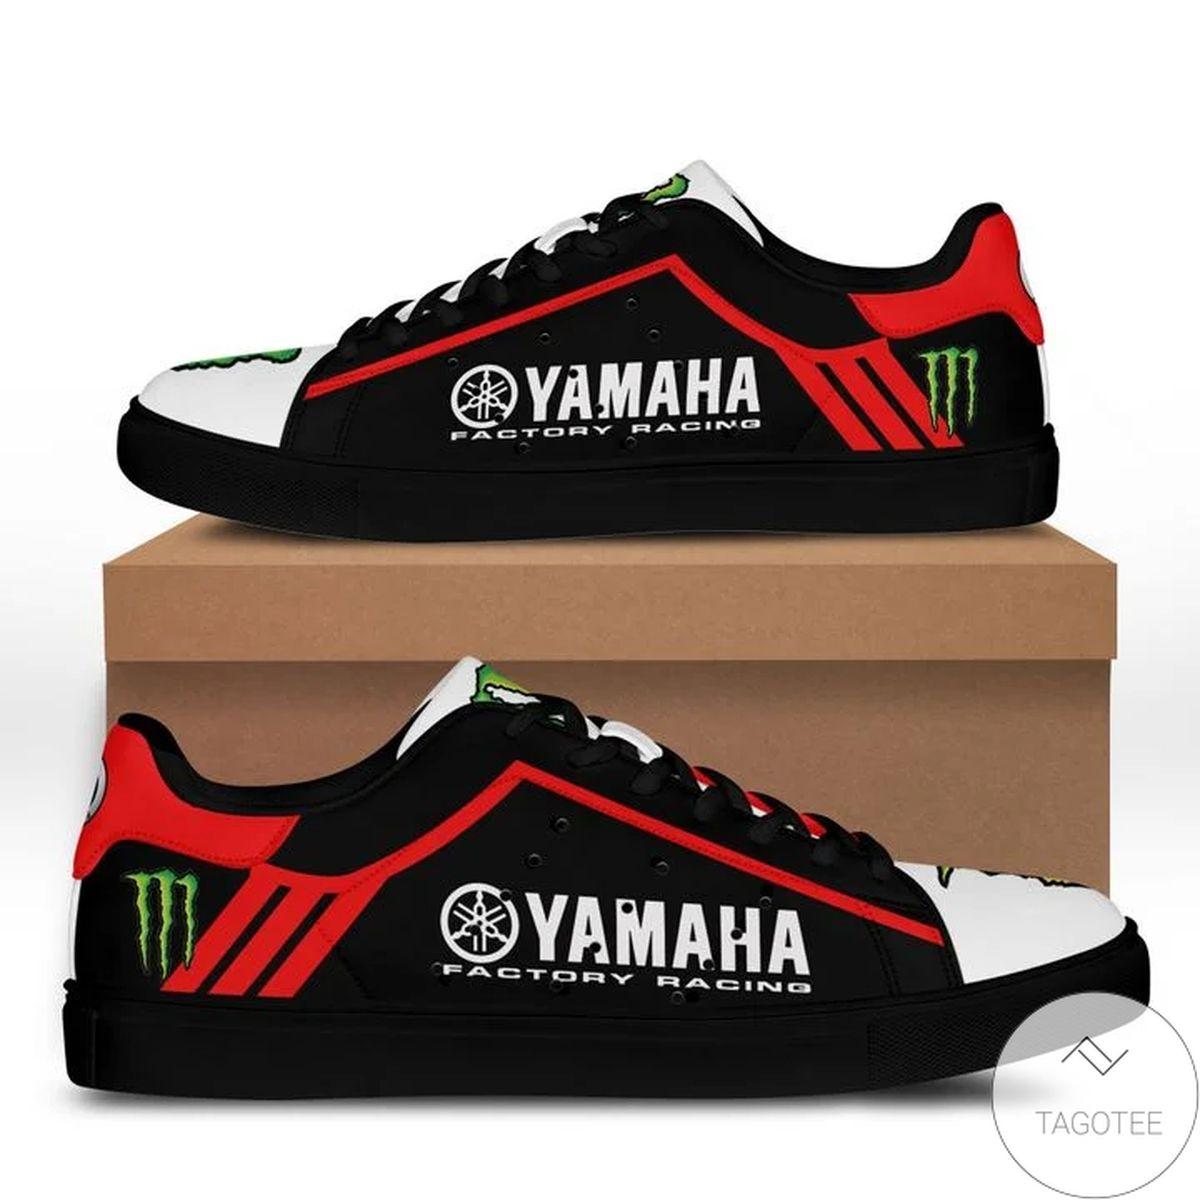 Yamaha Racing Red Black Stan Smith Shoes